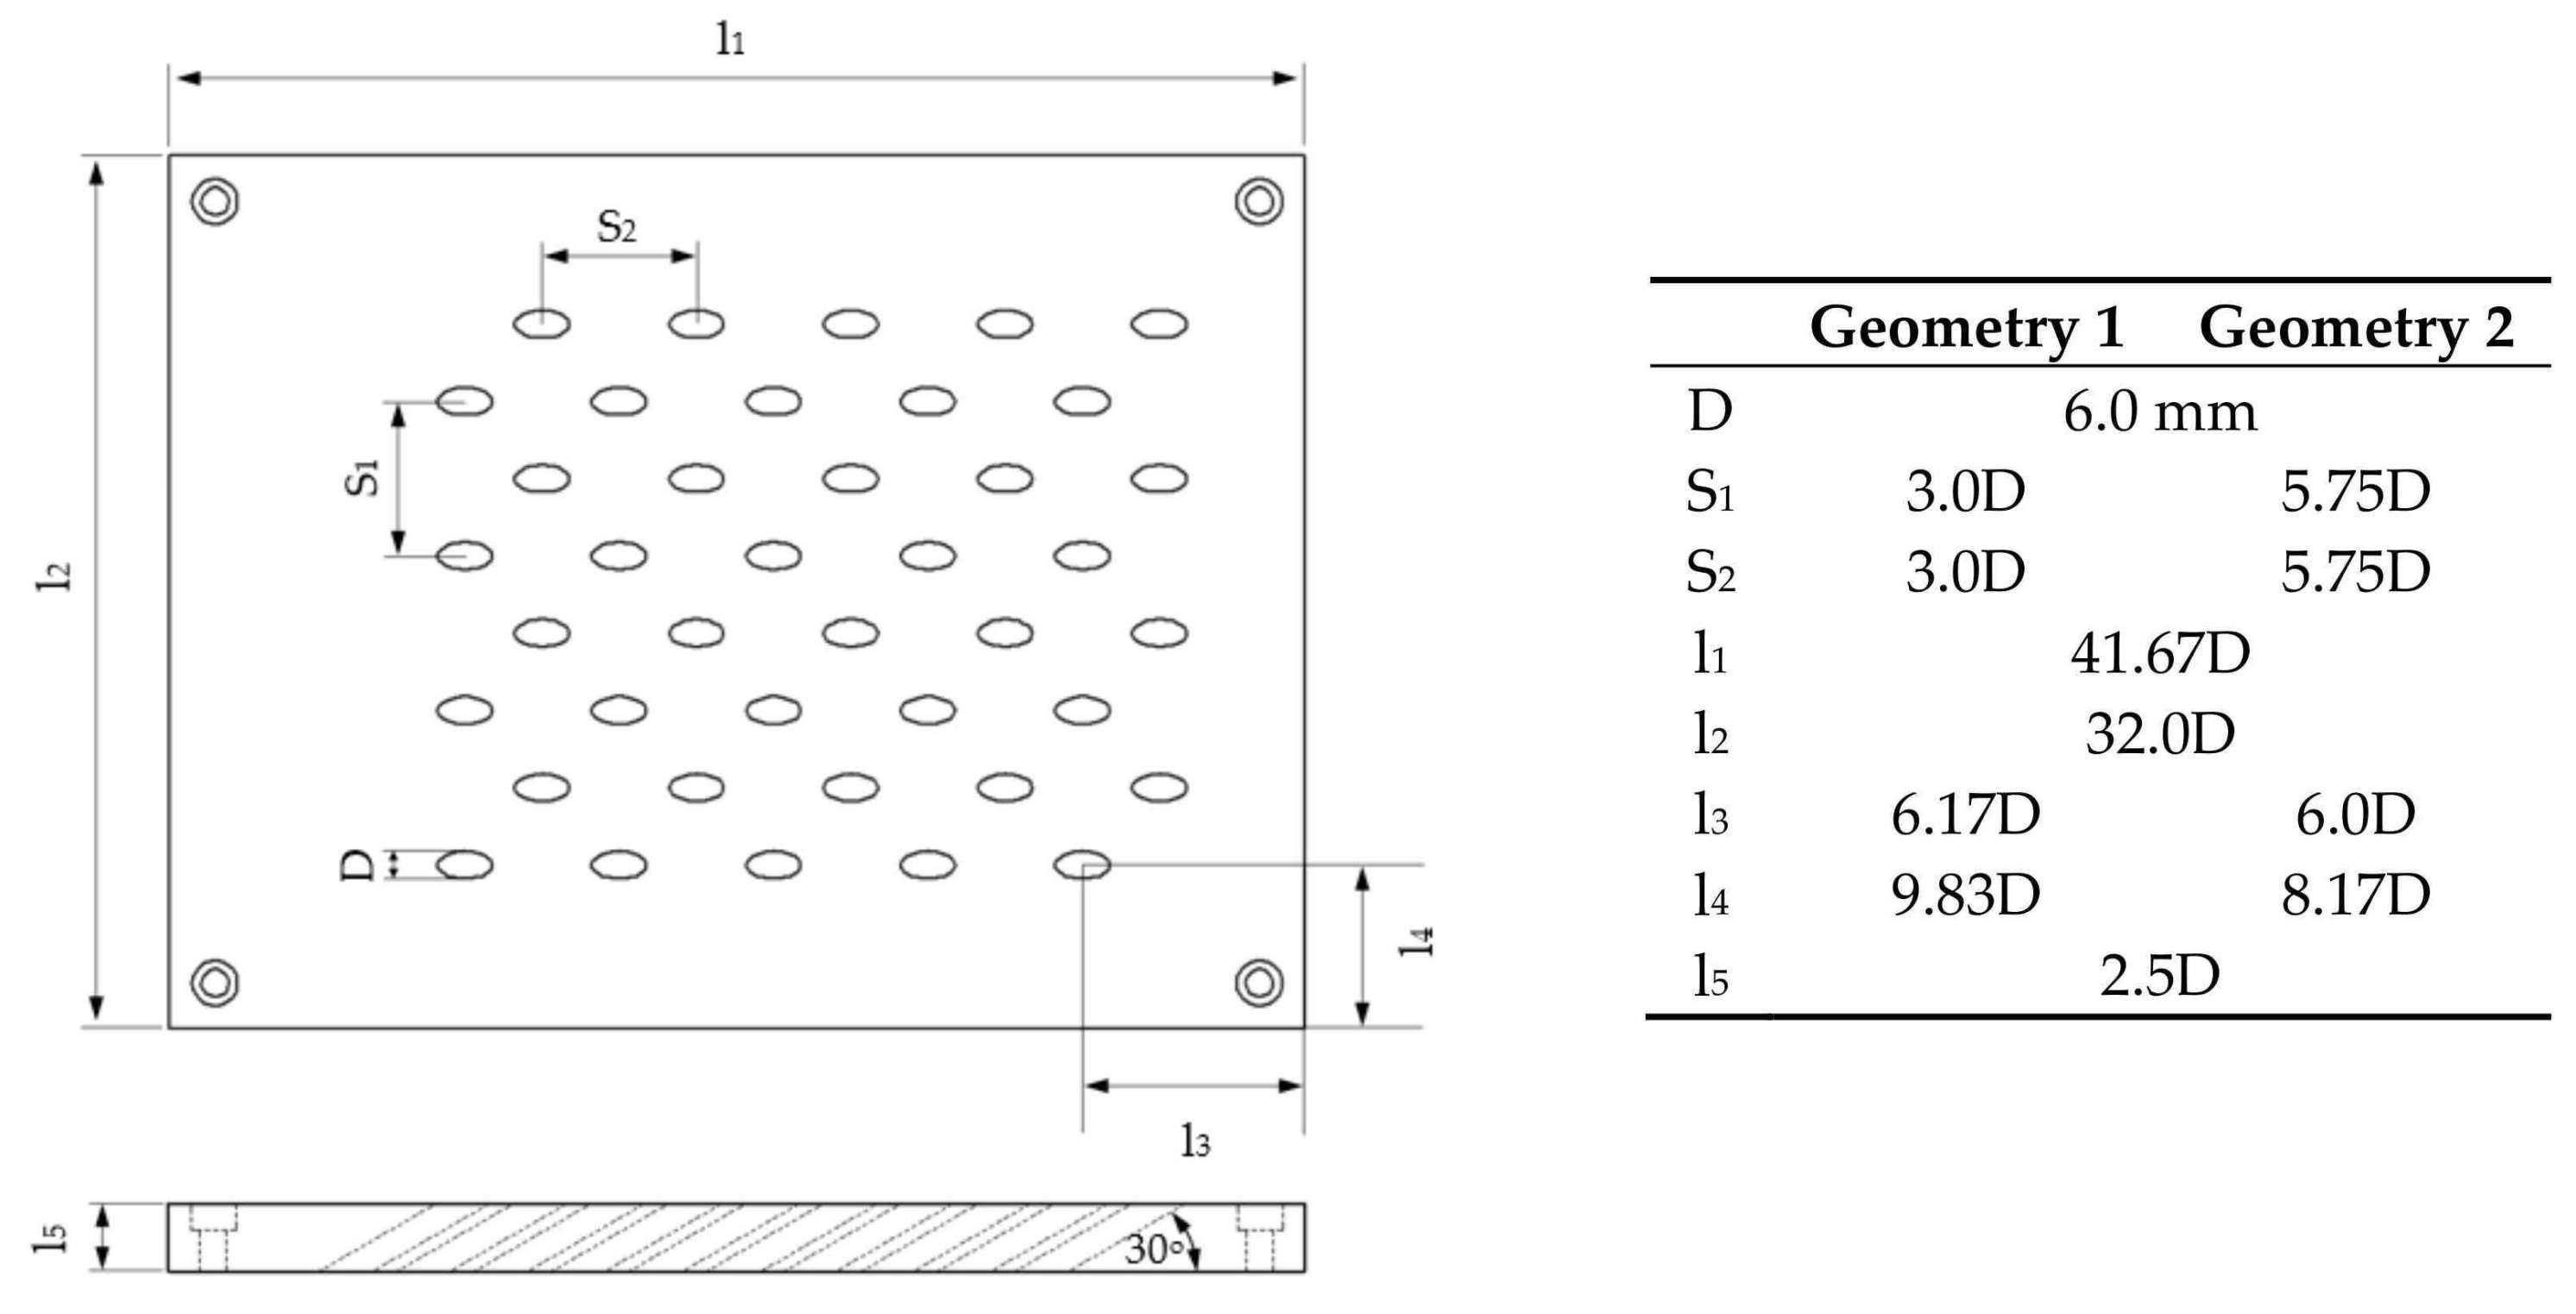 Open Concept Single Story Farmhouse Plans Awesome Open Concept Single Story Farmhouse Plans Sterli Business Plan Template Math Worksheets Letterhead Format [ 1523 x 2985 Pixel ]